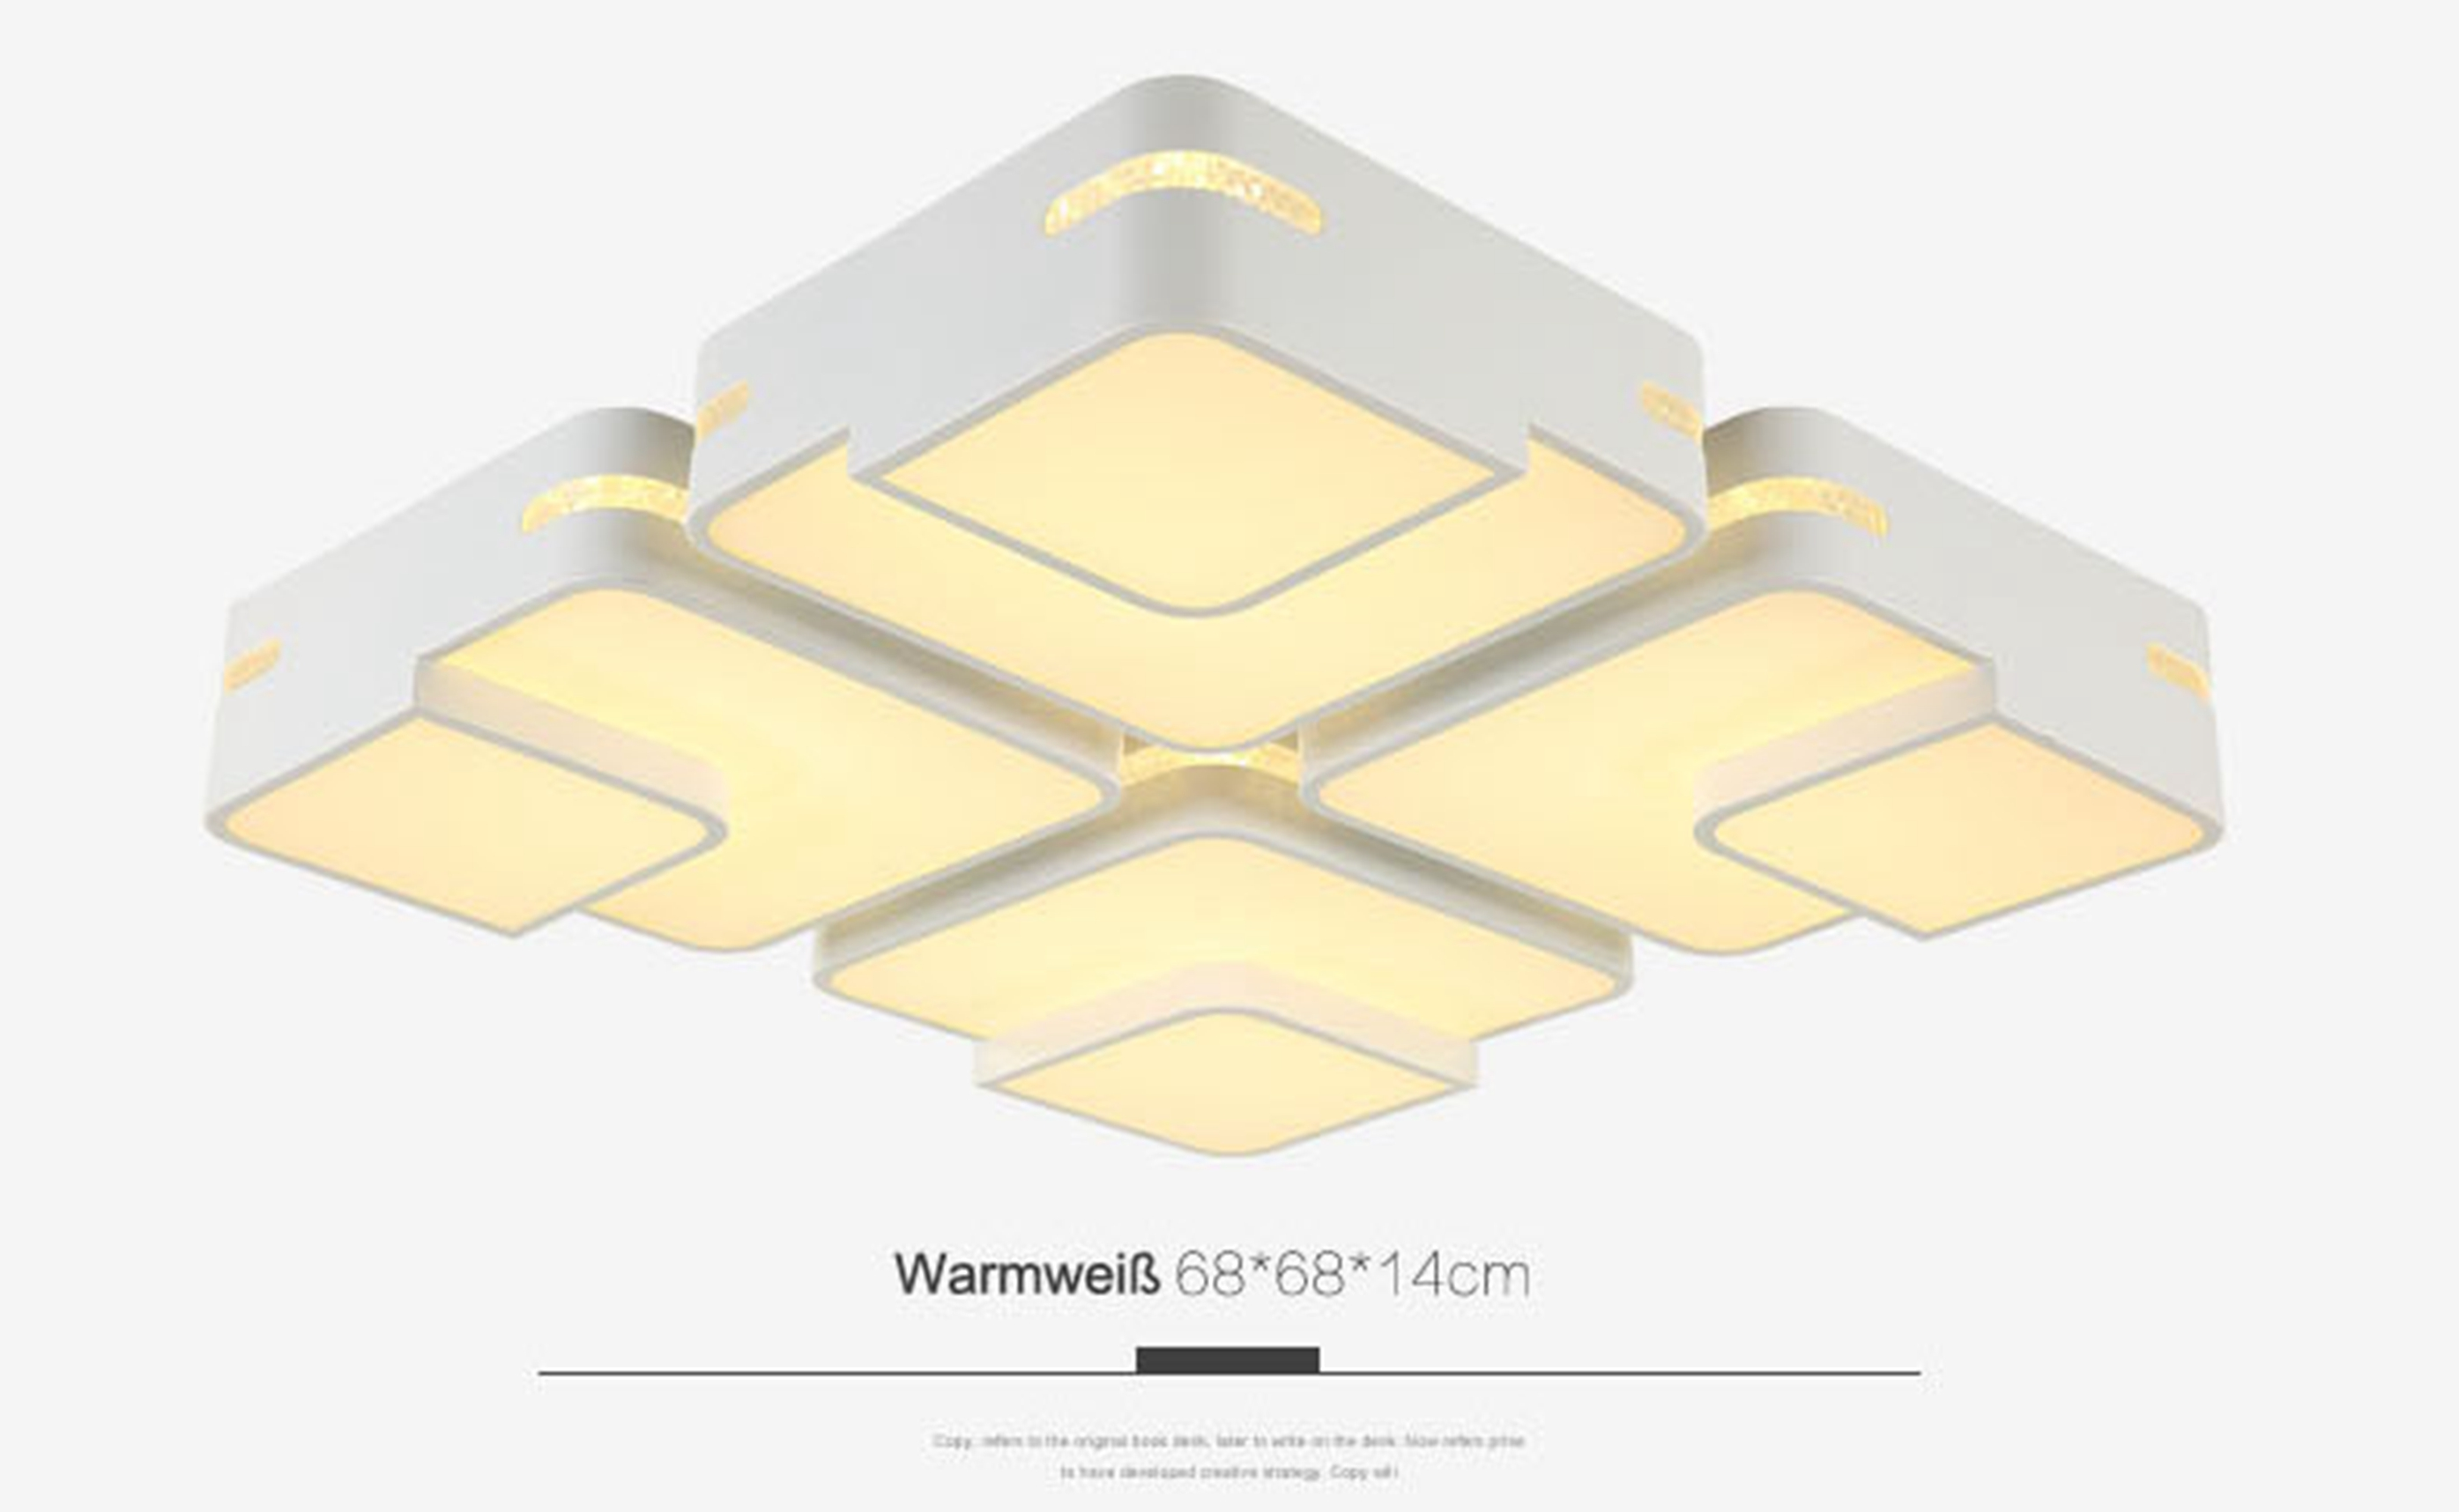 dimmbar led deckenlampe deckenleuchten 30w 72w wandlampe p. Black Bedroom Furniture Sets. Home Design Ideas